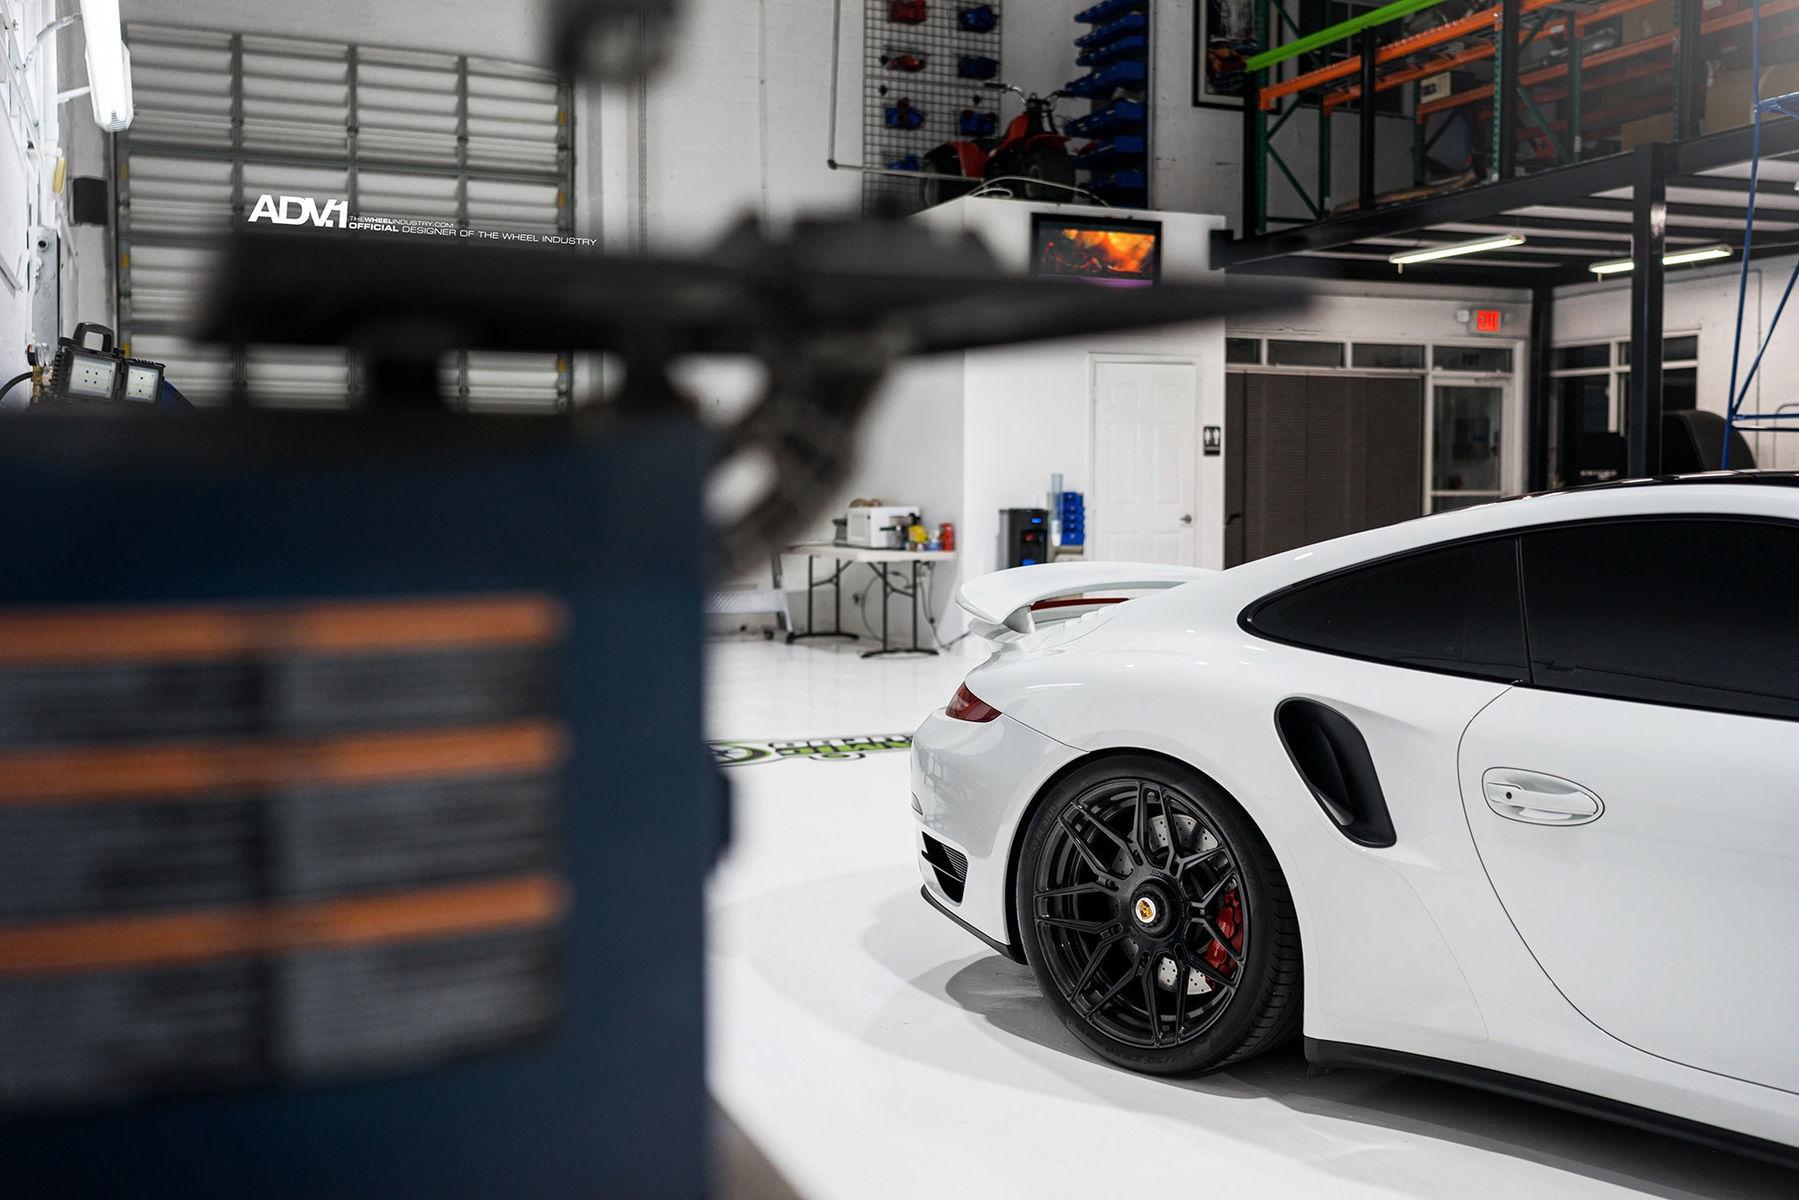 2016 Porsche 911   ADV.1 Wheel Porsche 991 Turbo S